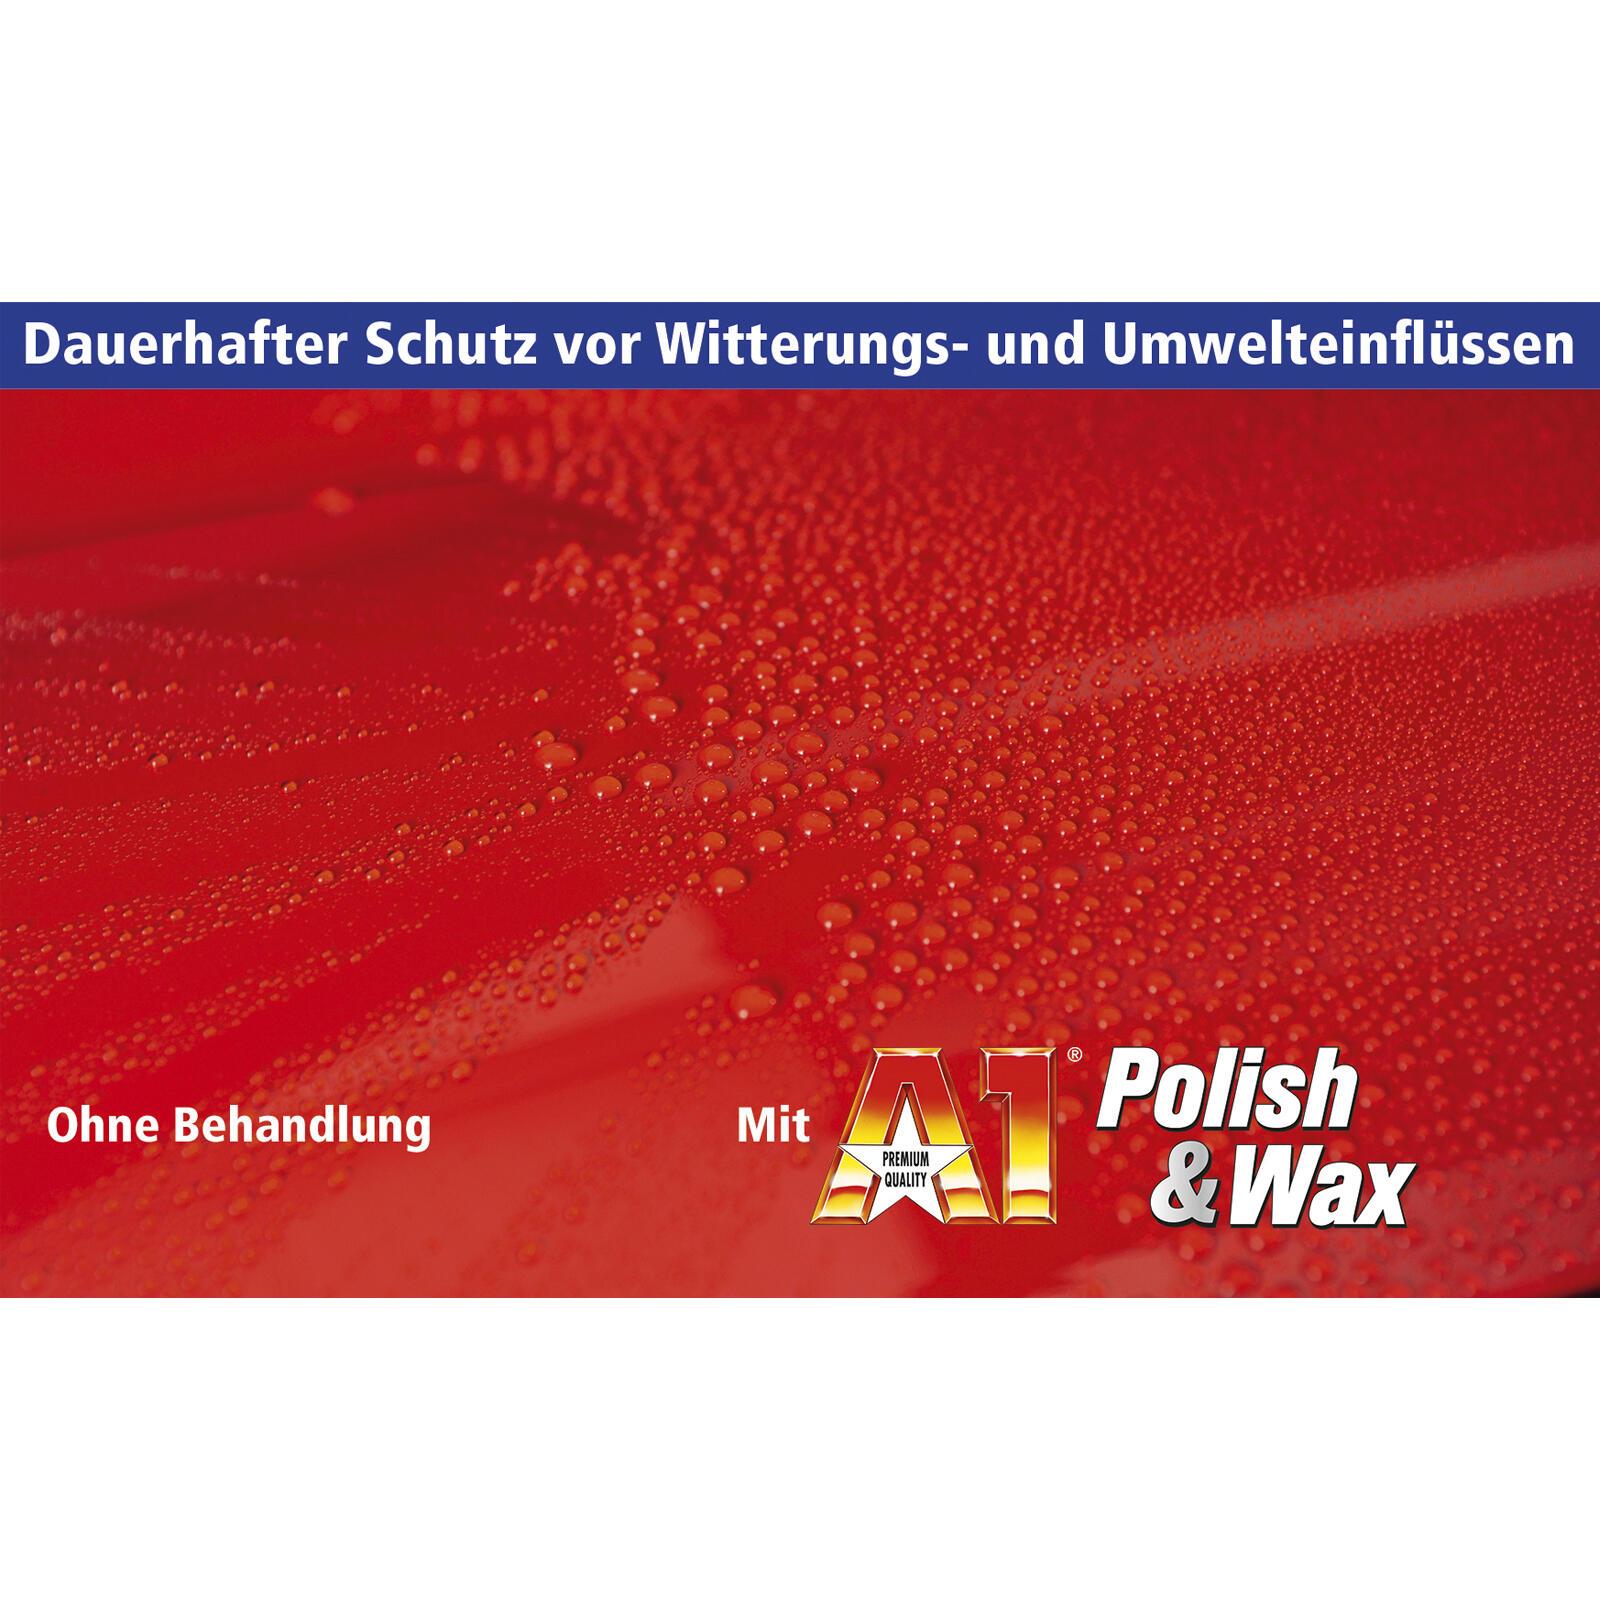 DR. Wack A1 Polish + Wax 500ml